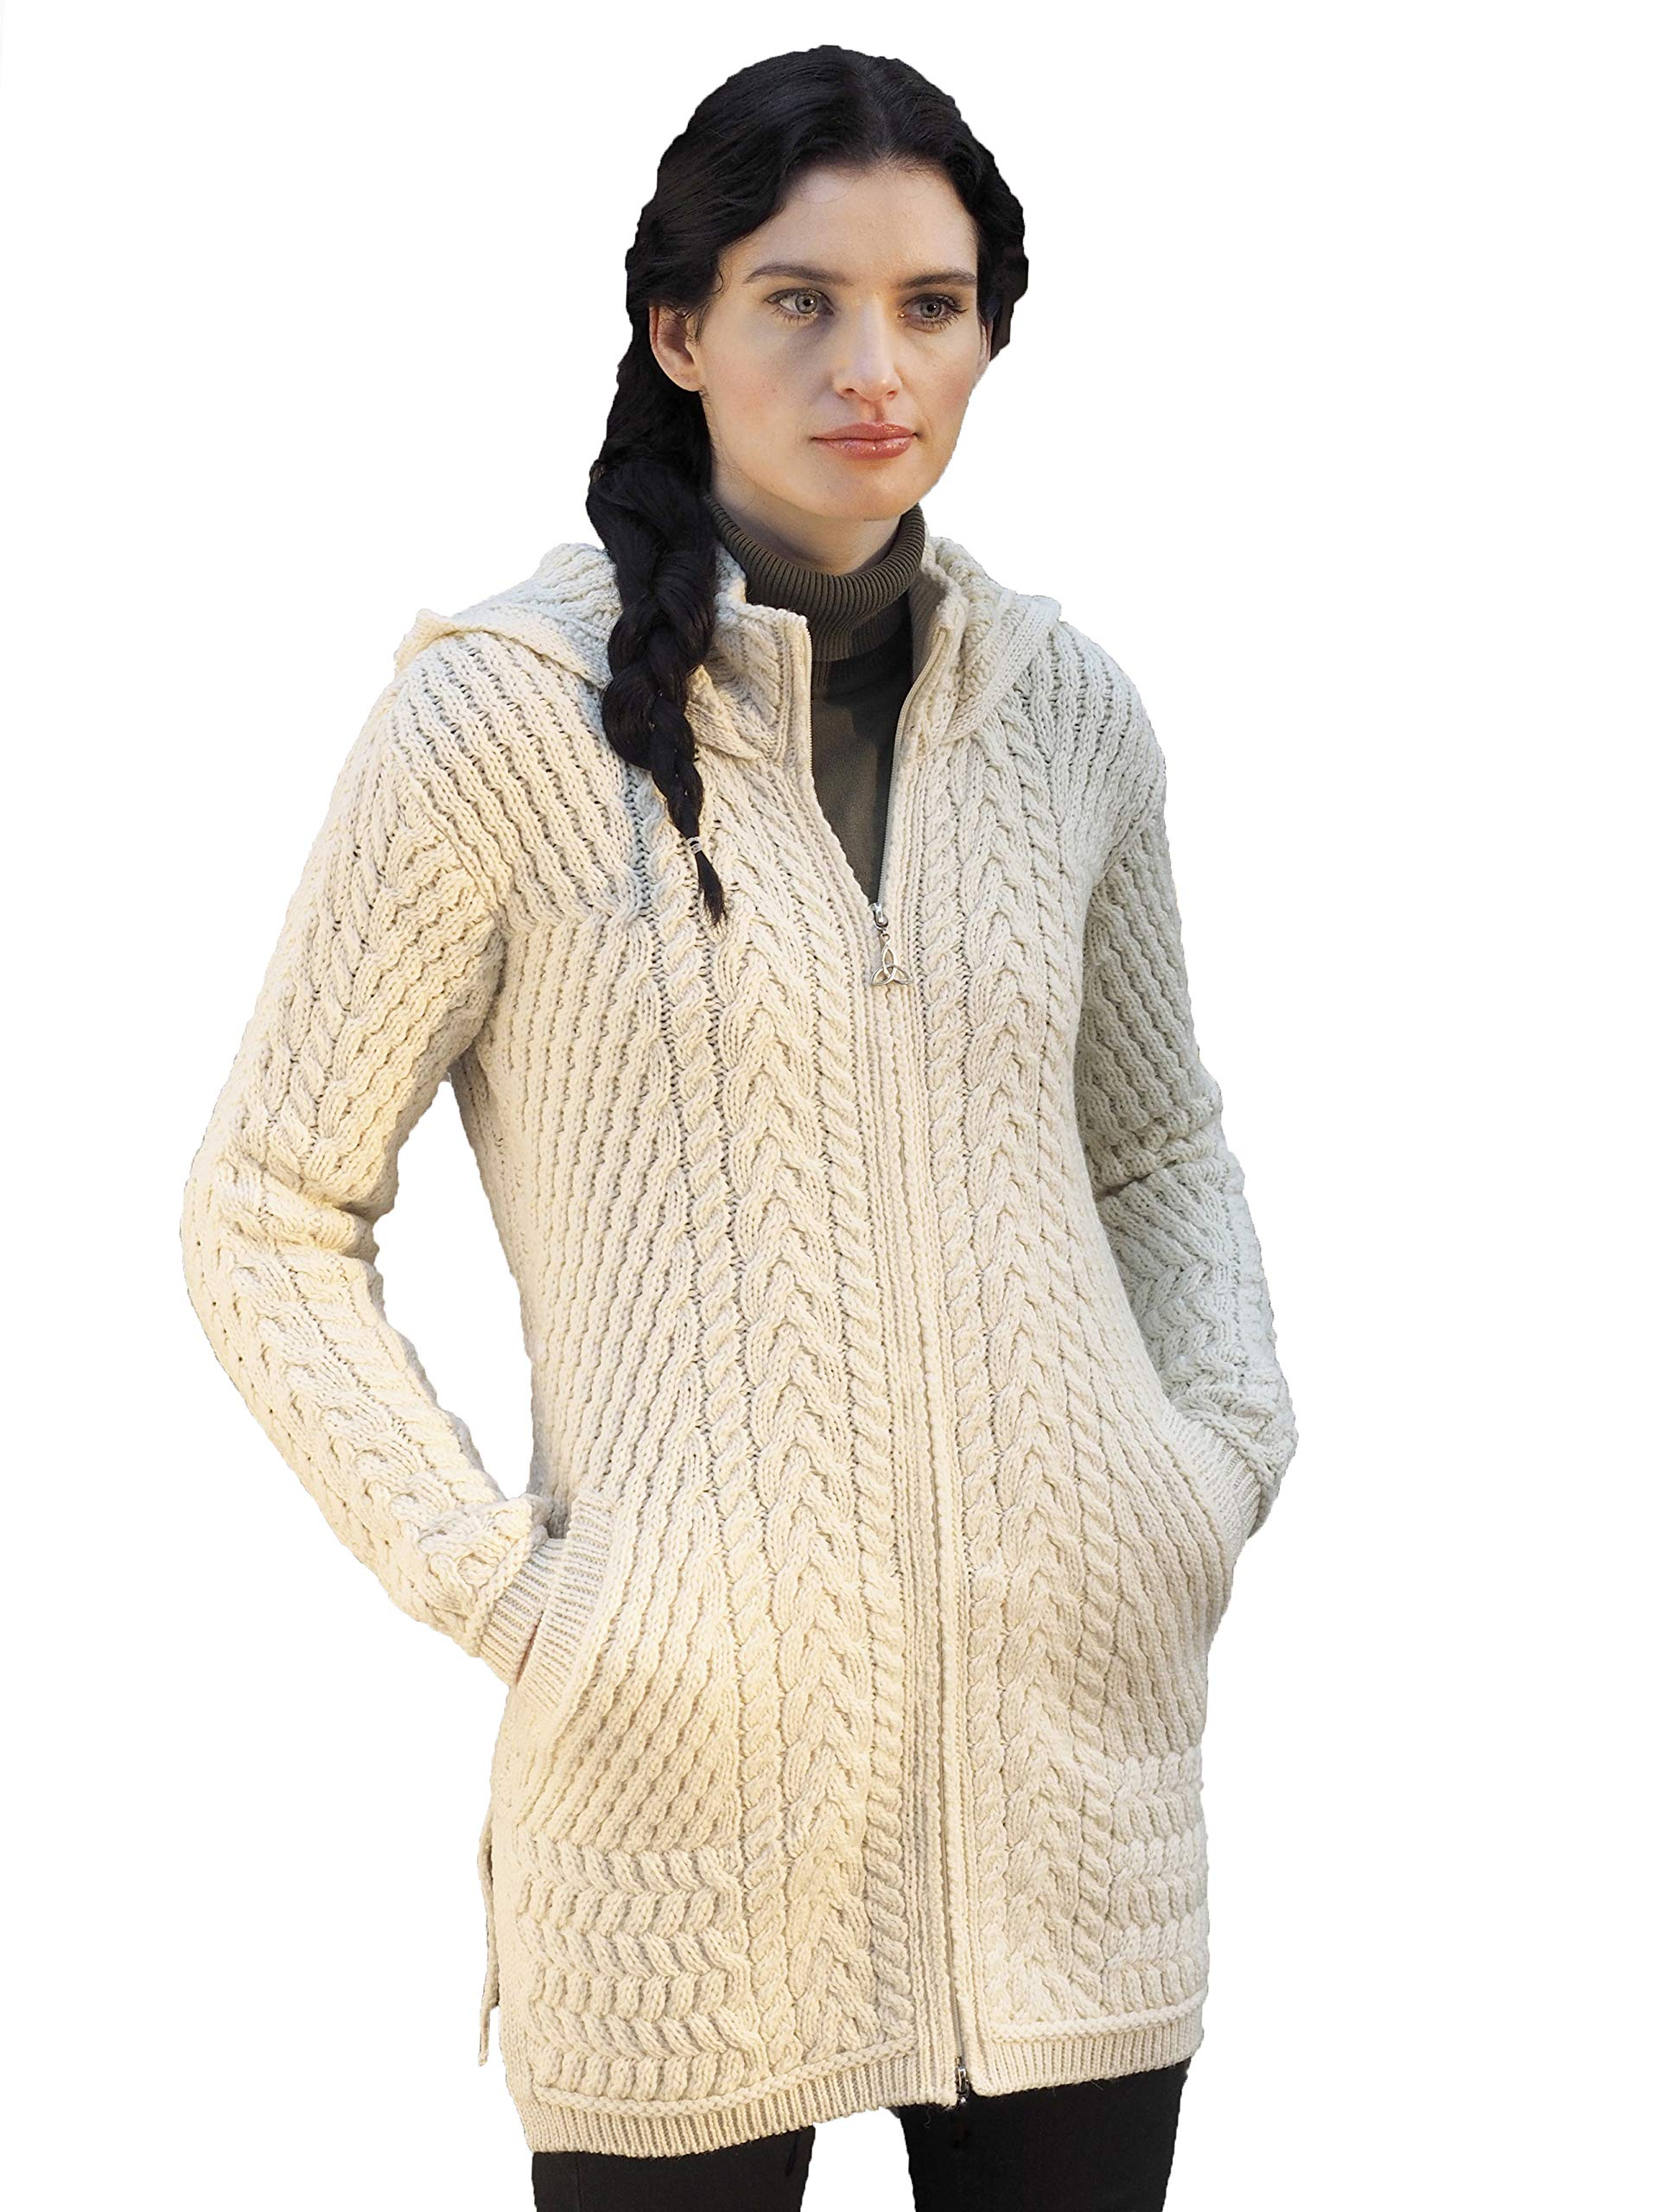 Aran Crafts Ribbed Merino Wool Coat with Hood MED Natural (HD4826-MED-NAT)